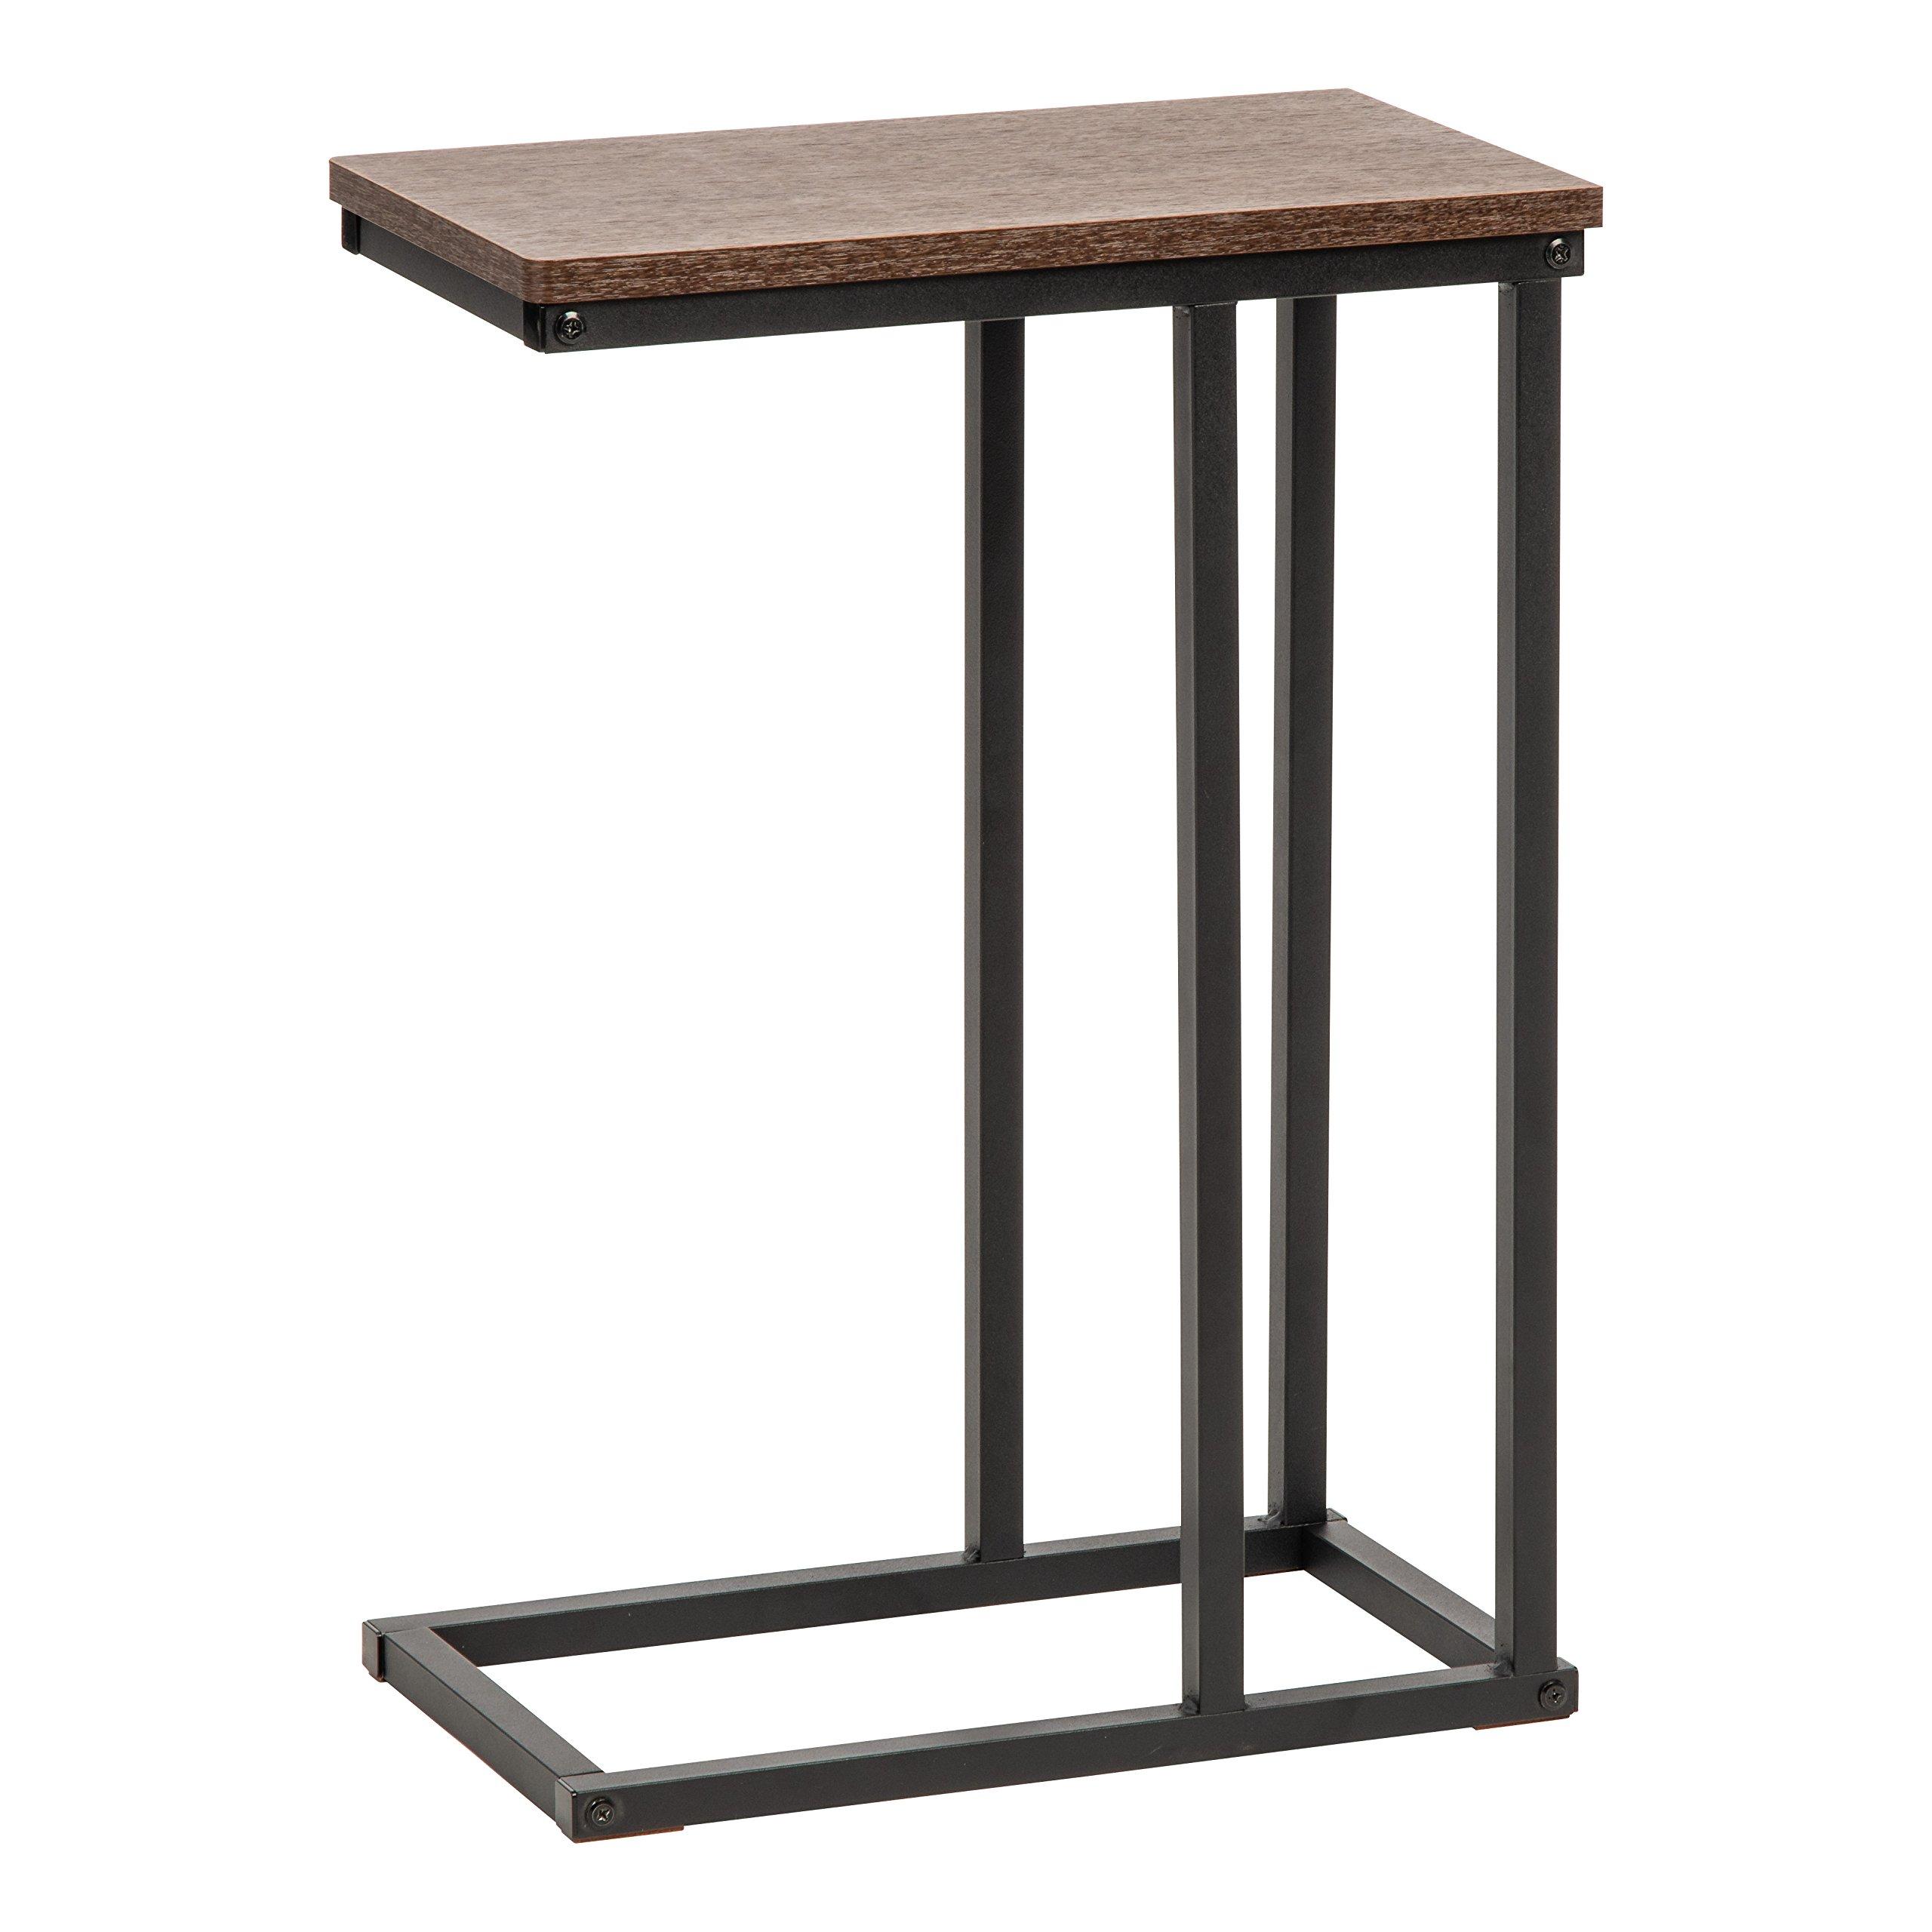 IRIS USA 596650 SDT-L Side Table, Brown